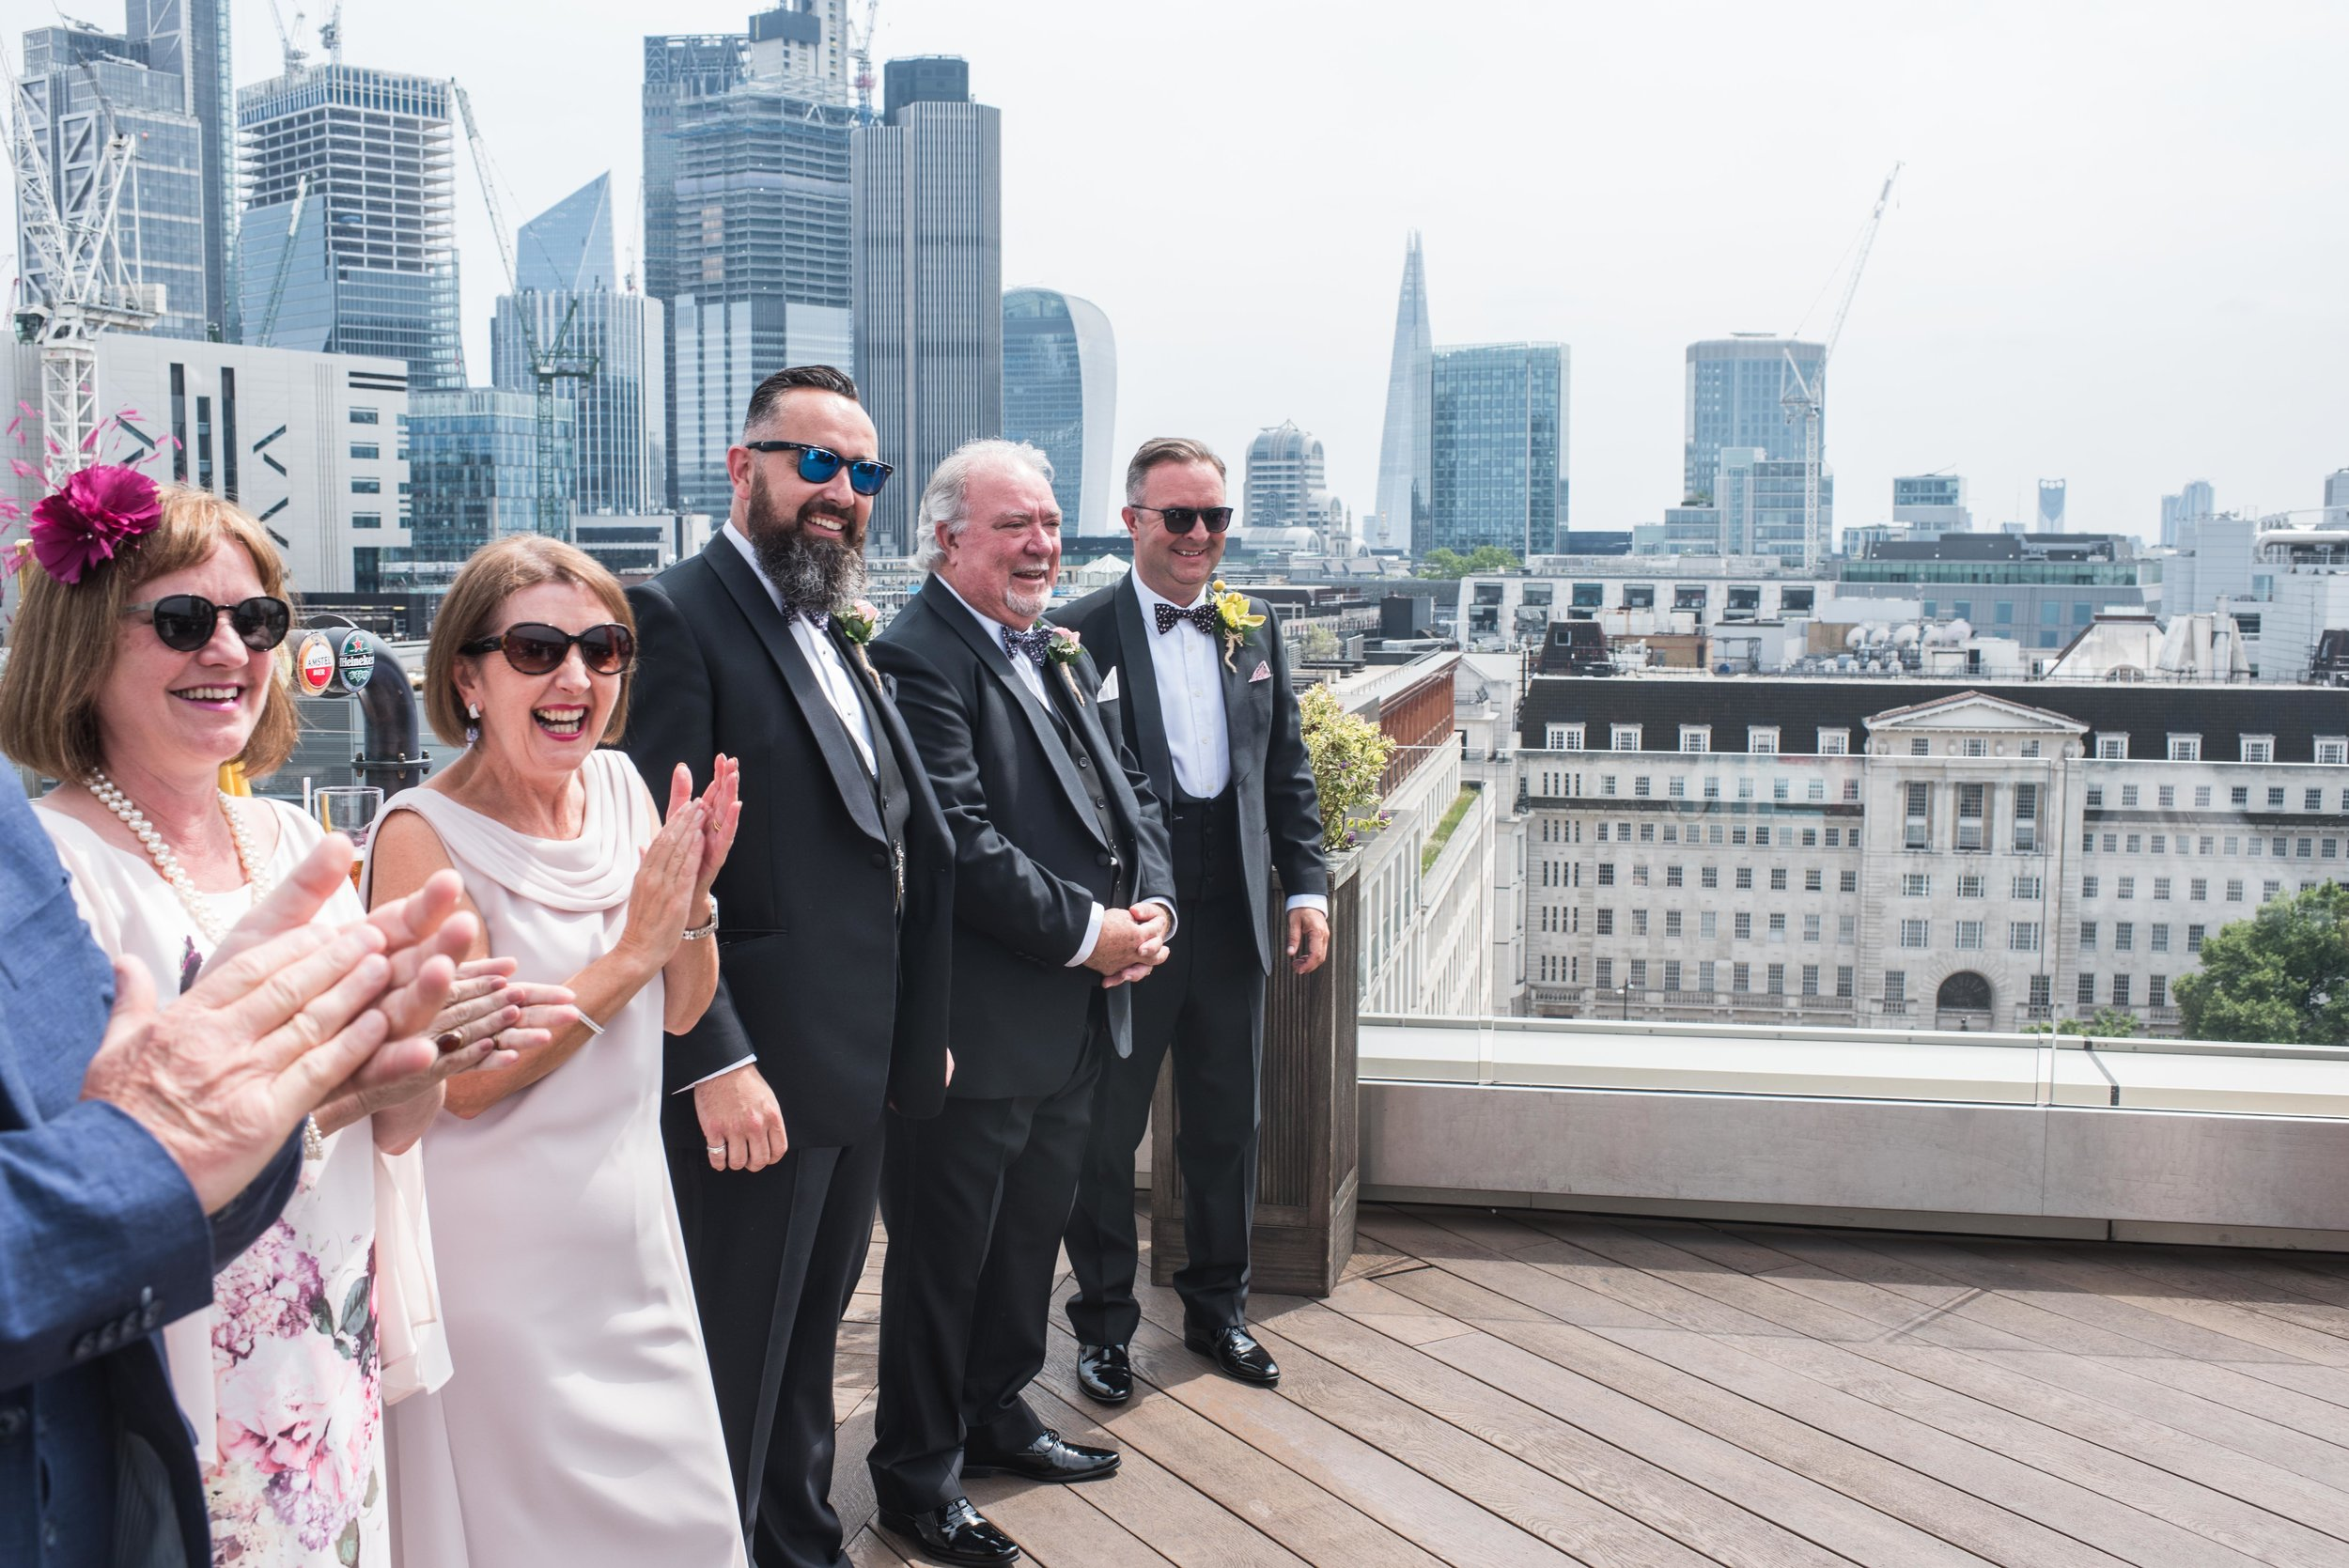 D&M_Marylebone Town Hall Wedding (26 of 239).jpg